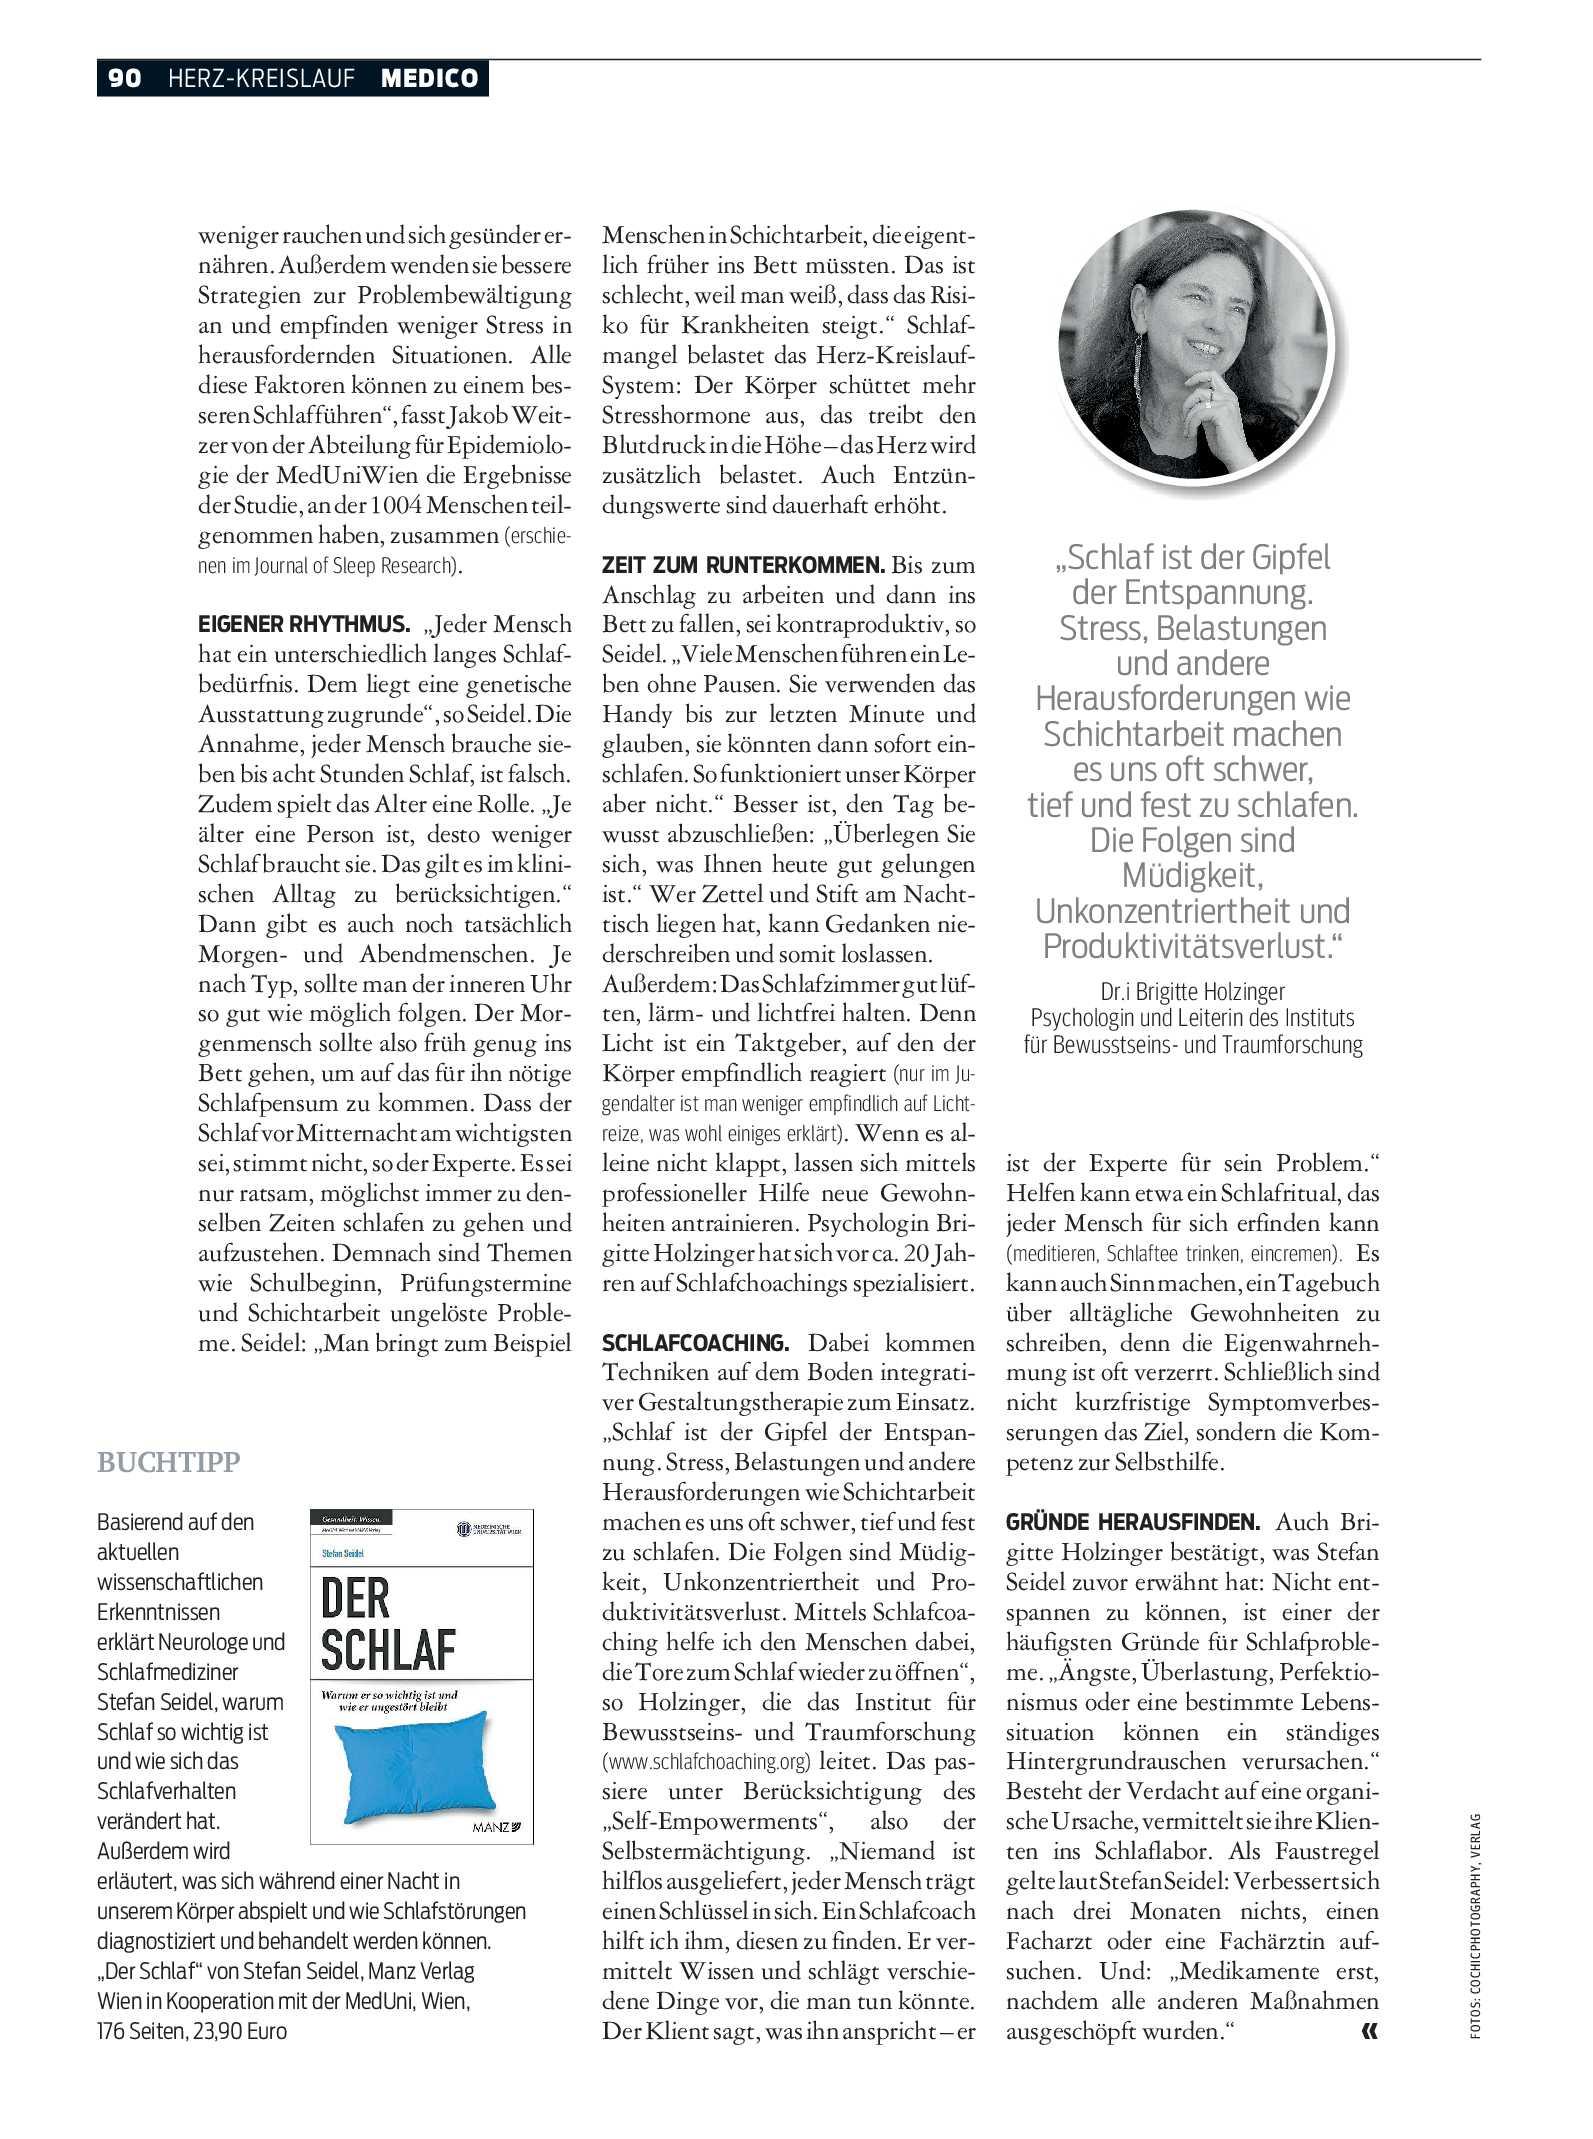 public/epaper/imported/20201125/kurier/magazin/magazin_20201125_090.jpg